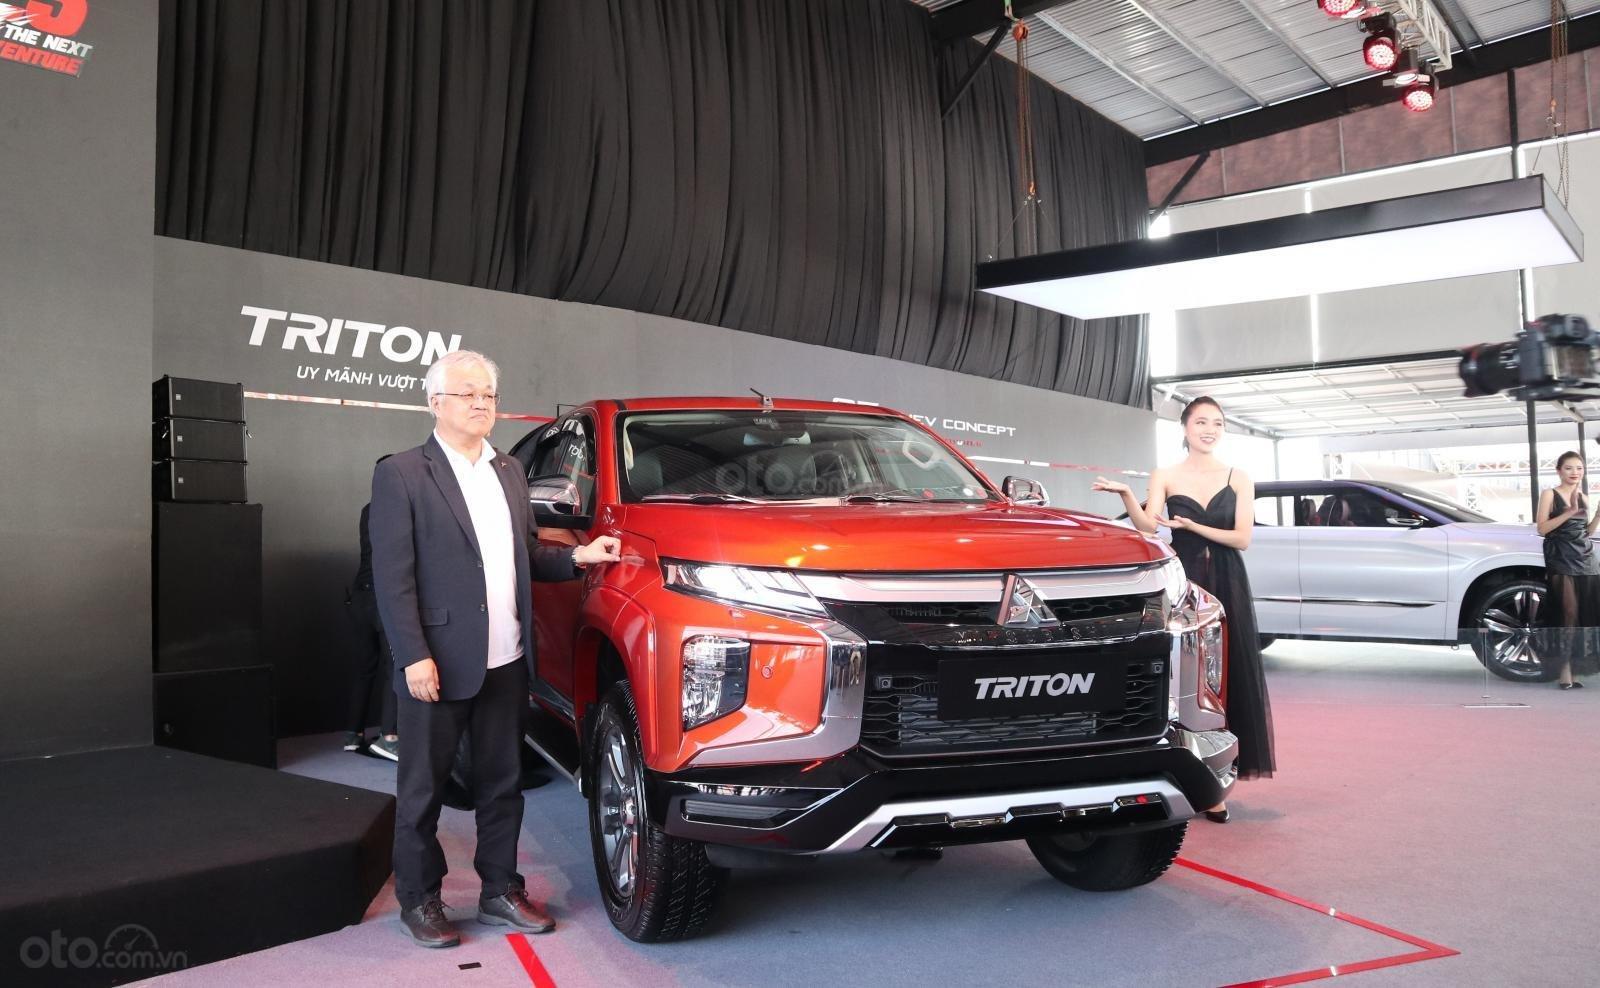 chon-mau-xe-mitsubishi-triton-2020-theo-phong-thuy